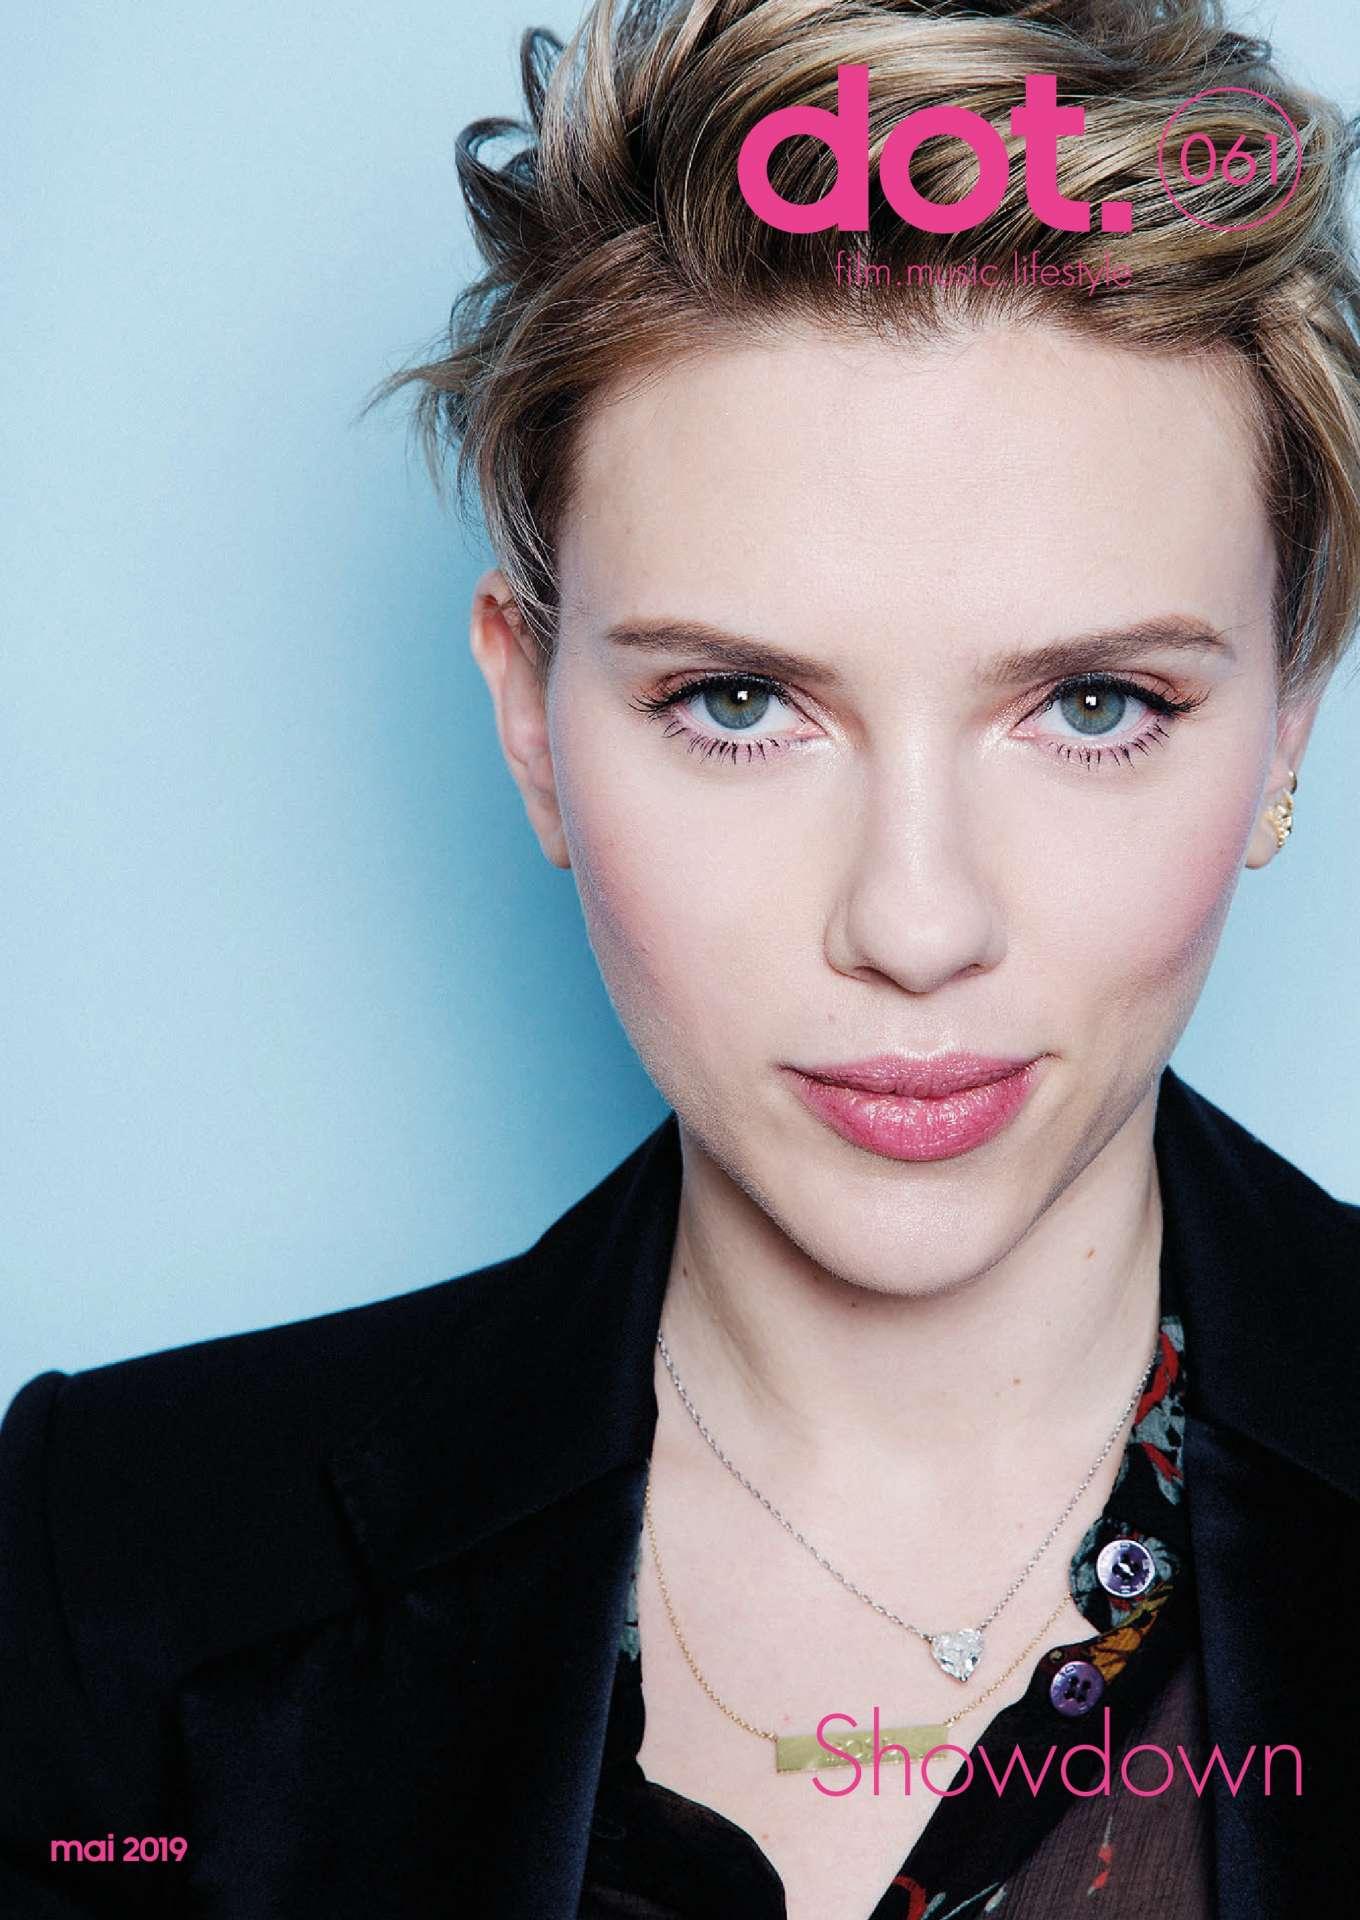 Scarlett Johansson - Dot. Magazine (May 2019)